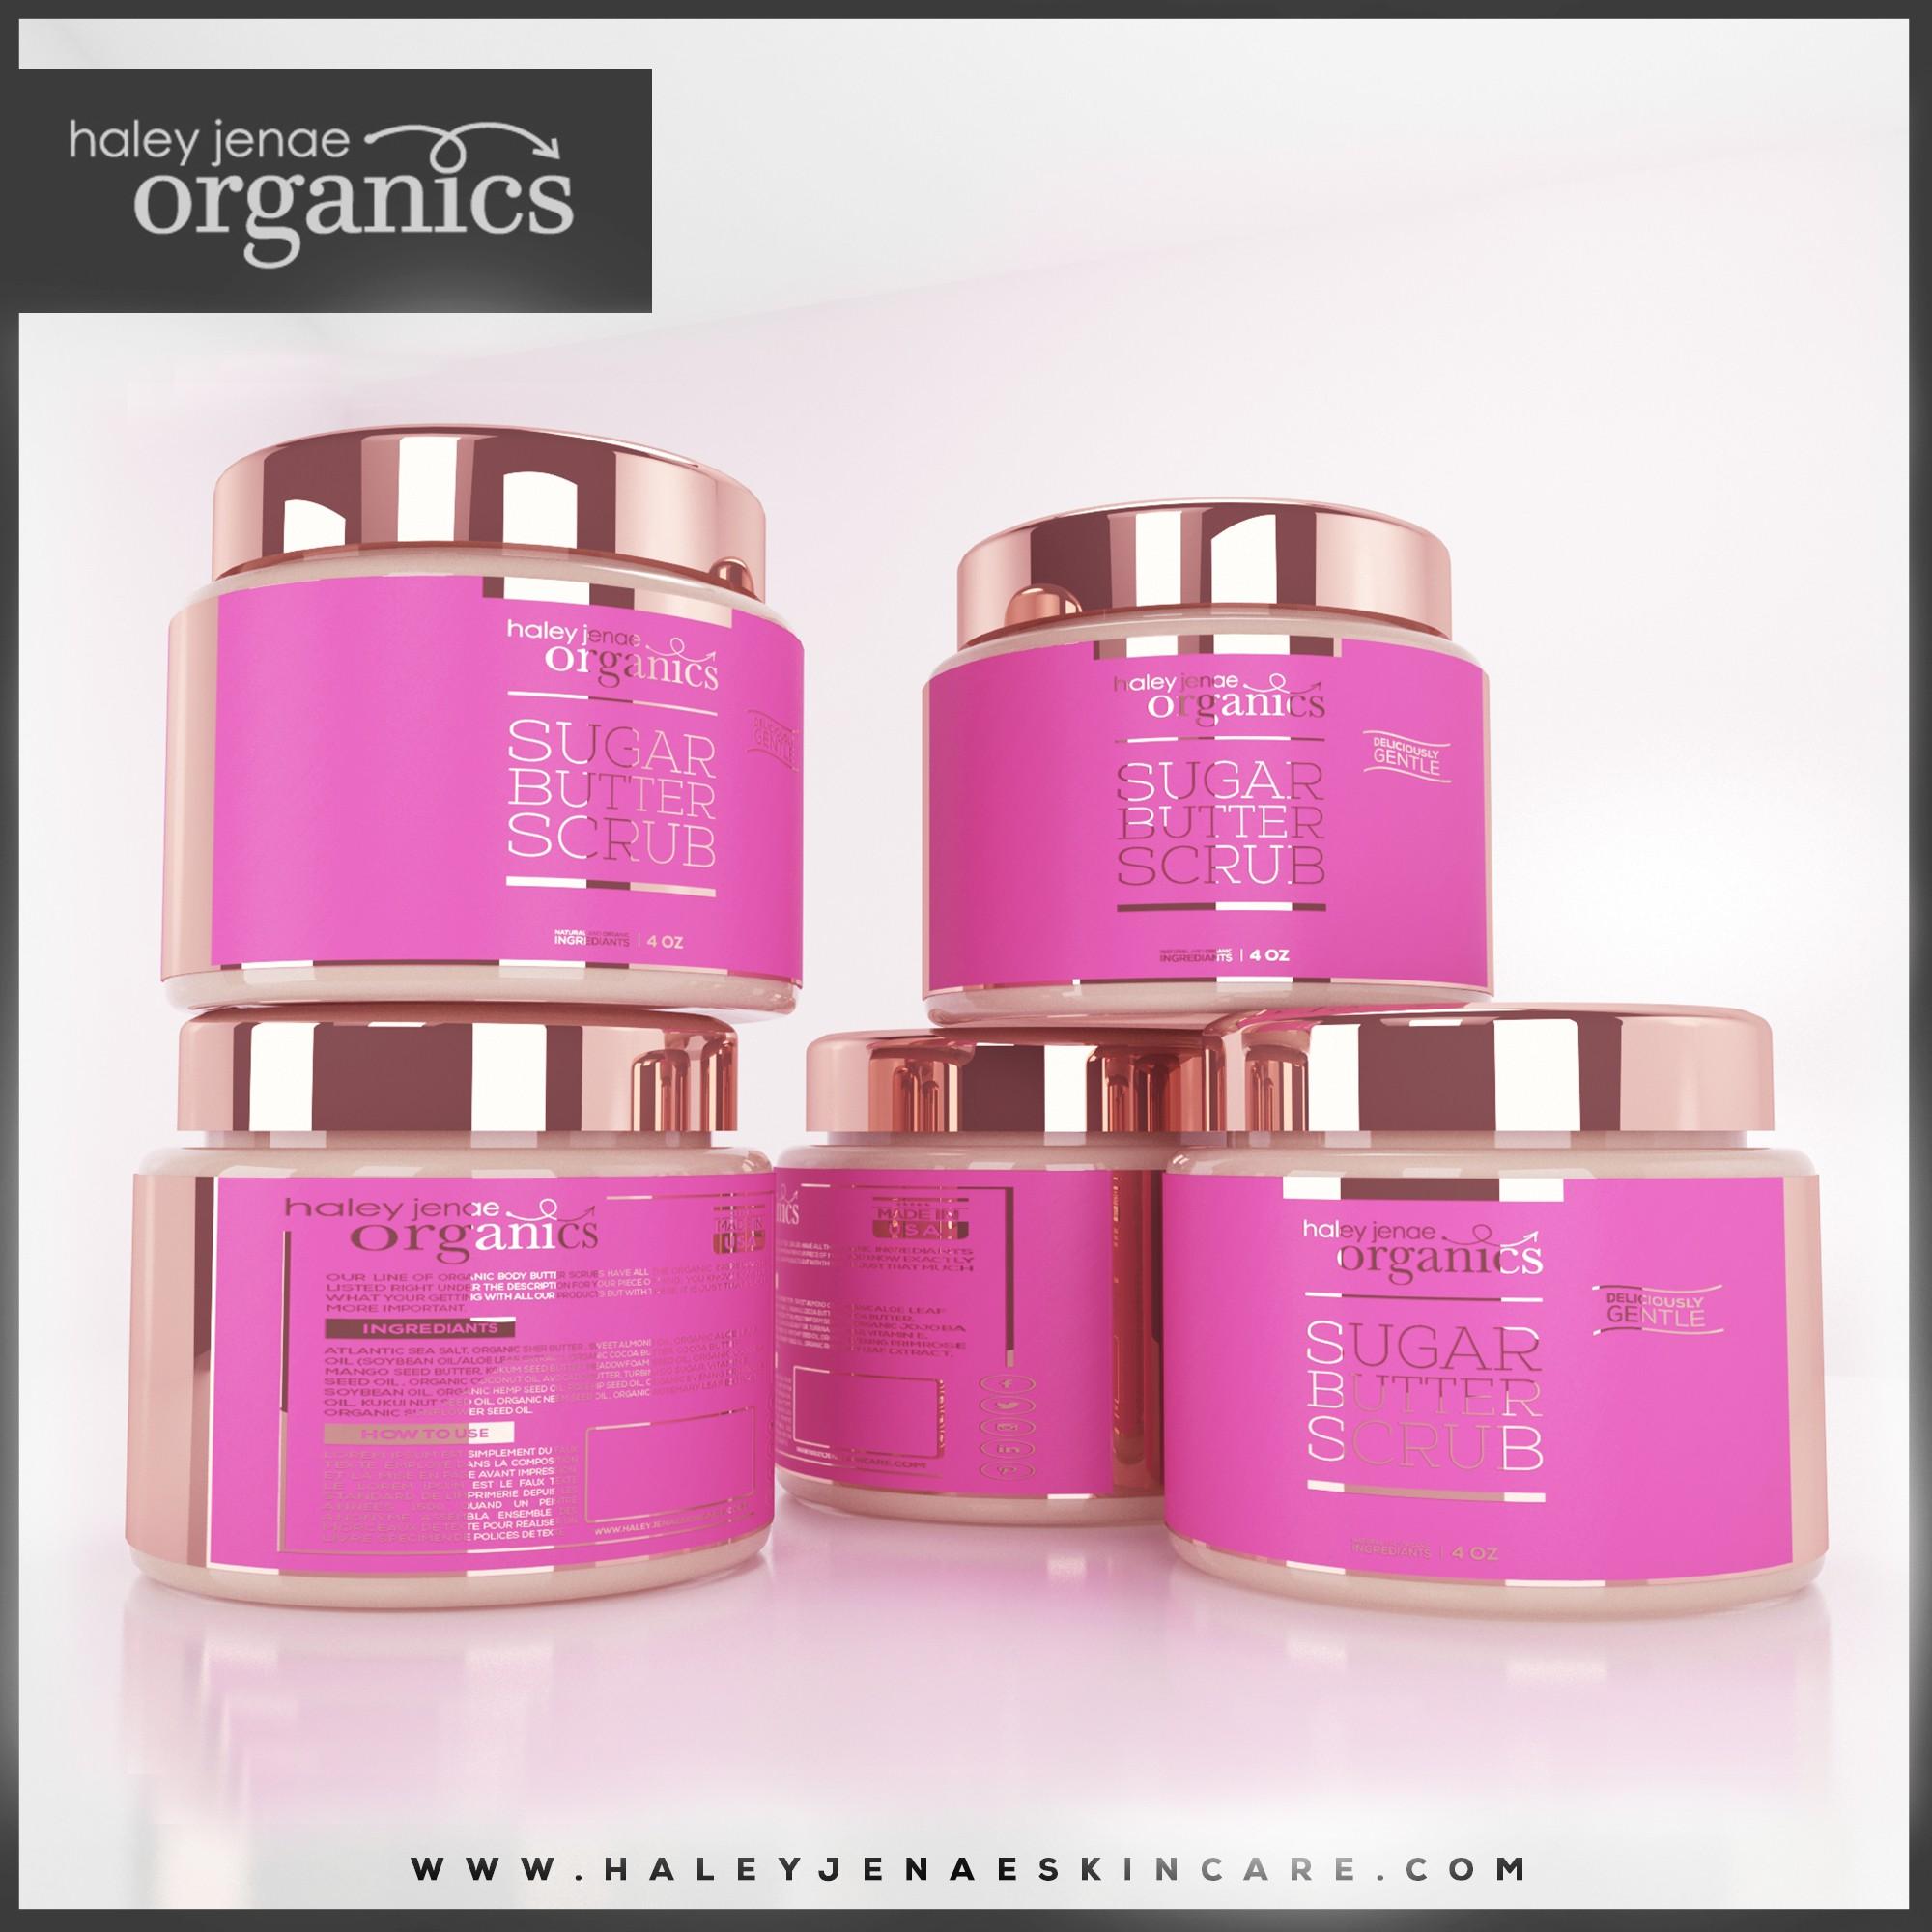 Create a modern twist for an organic skincare line for Haley Jenae skincare